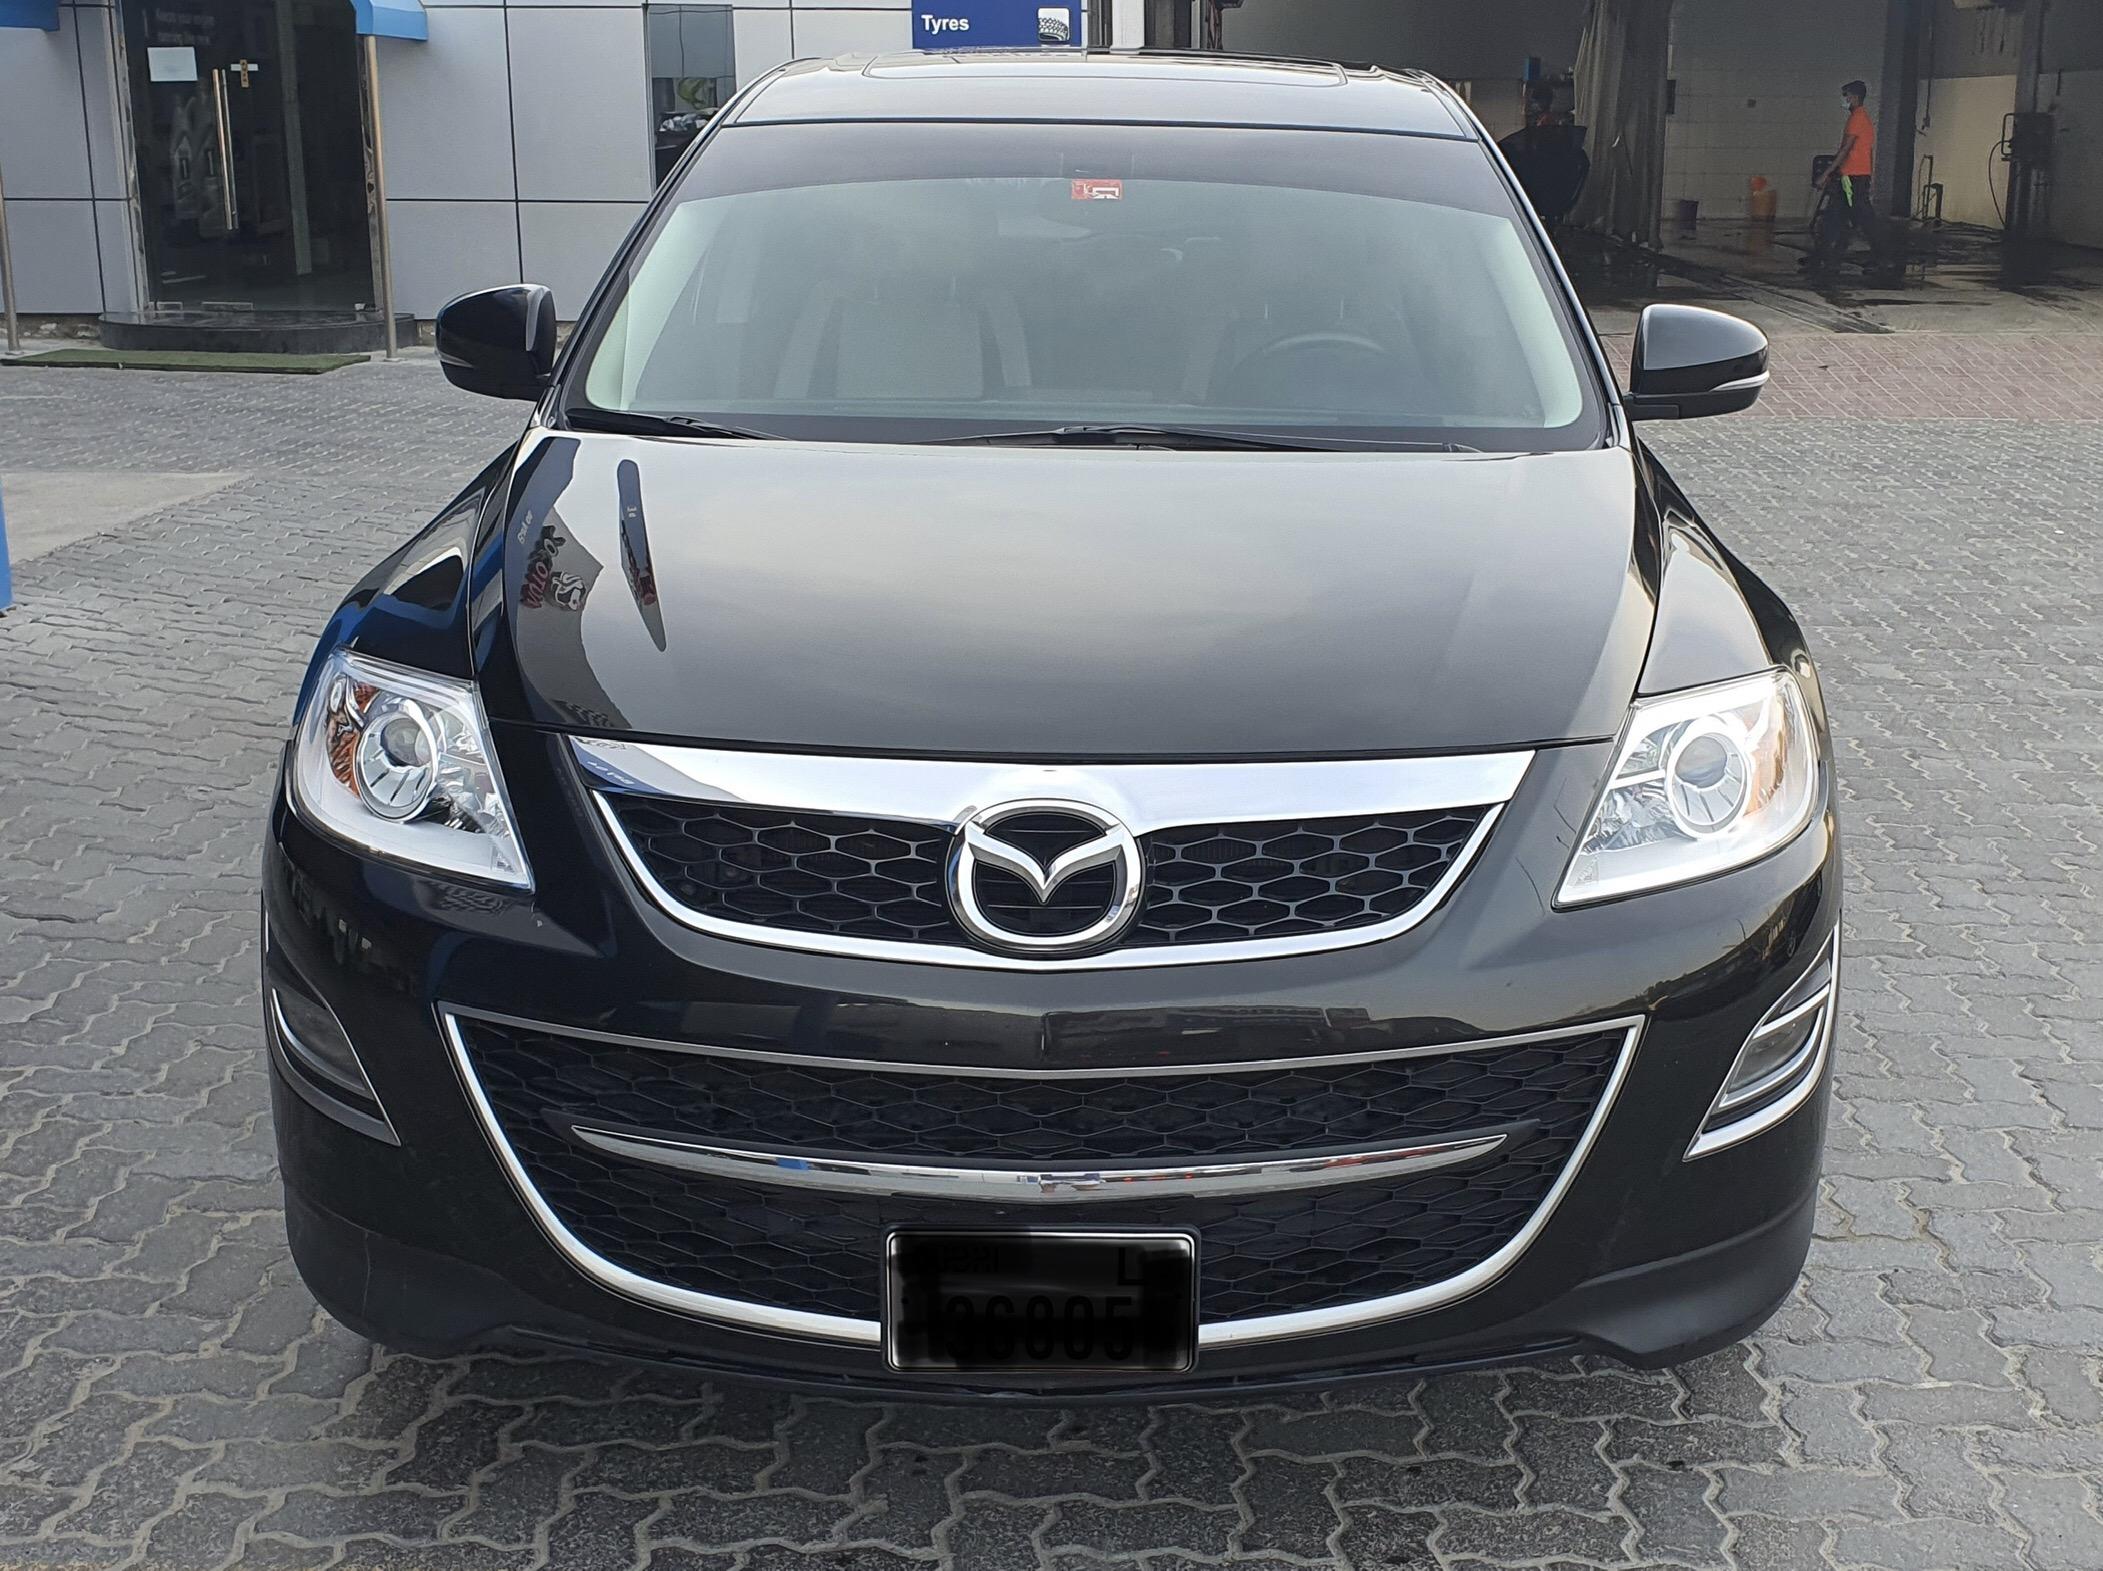 Kekurangan Mazda Cx 9 2011 Perbandingan Harga